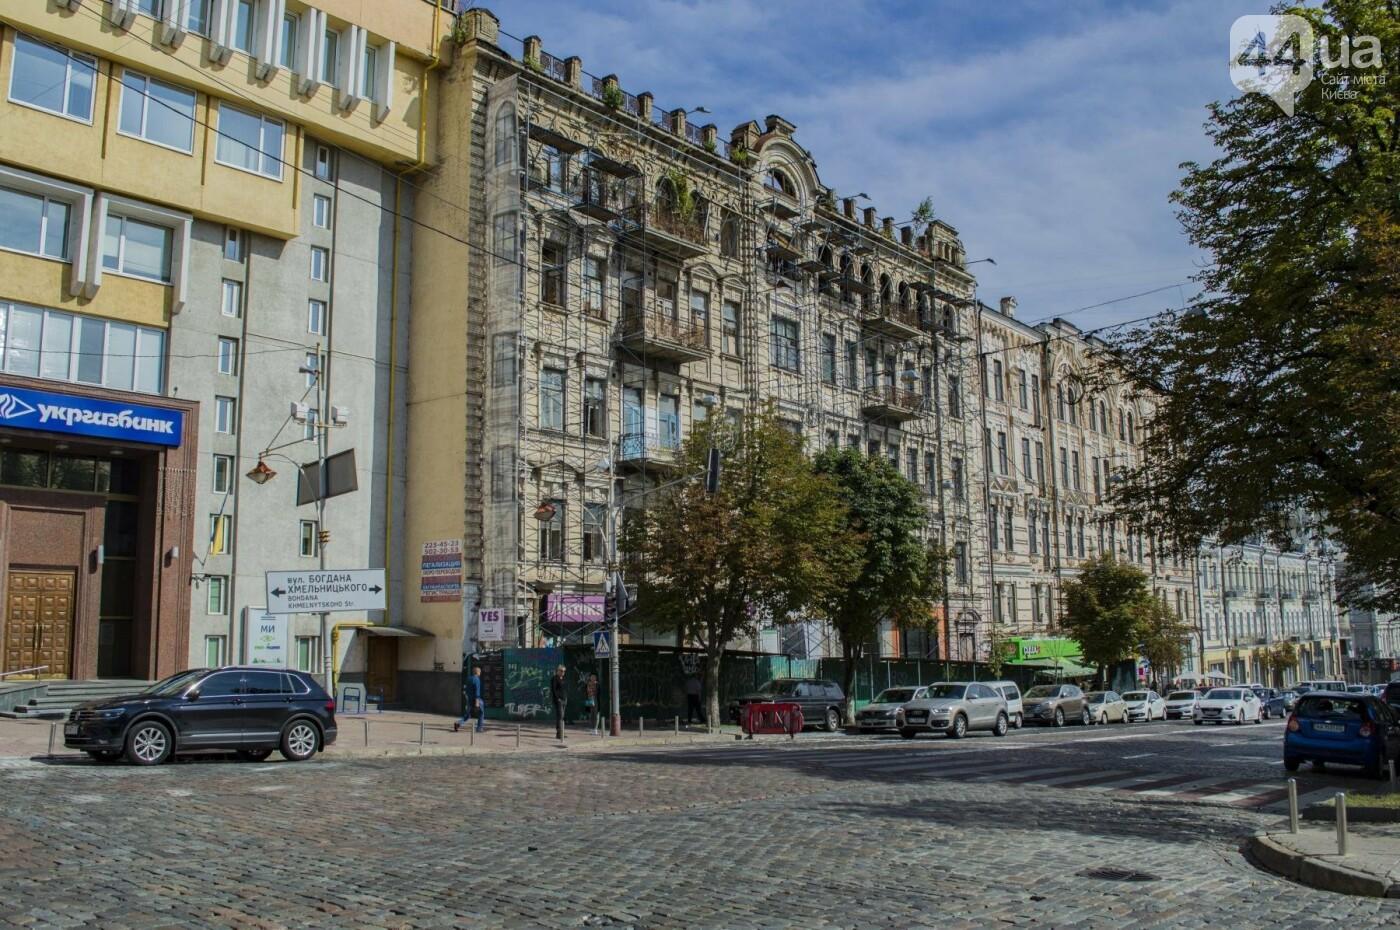 В центре Киева спасут от разрушения исторический дом, фото-1